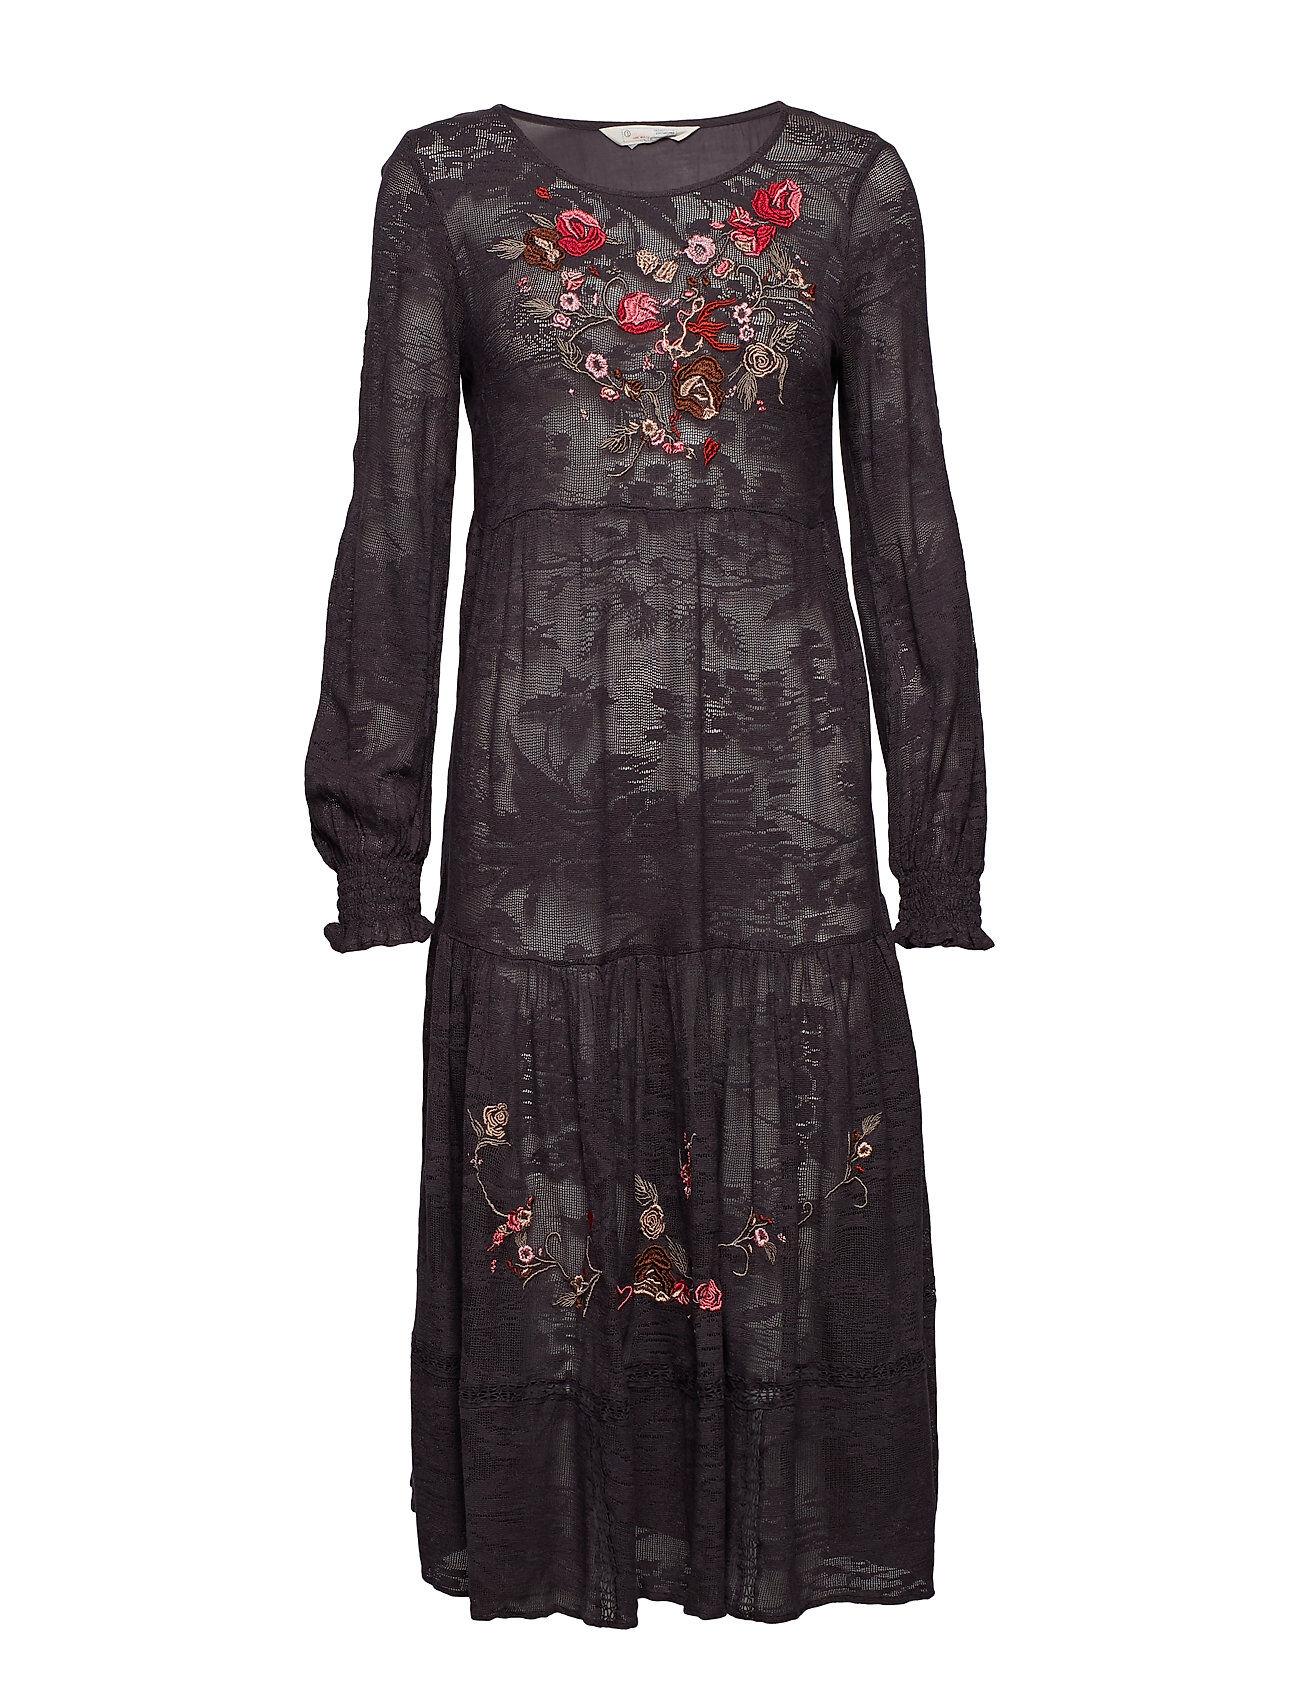 Image of ODD MOLLY Misty Magic Dress Polvipituinen Mekko Musta ODD MOLLY